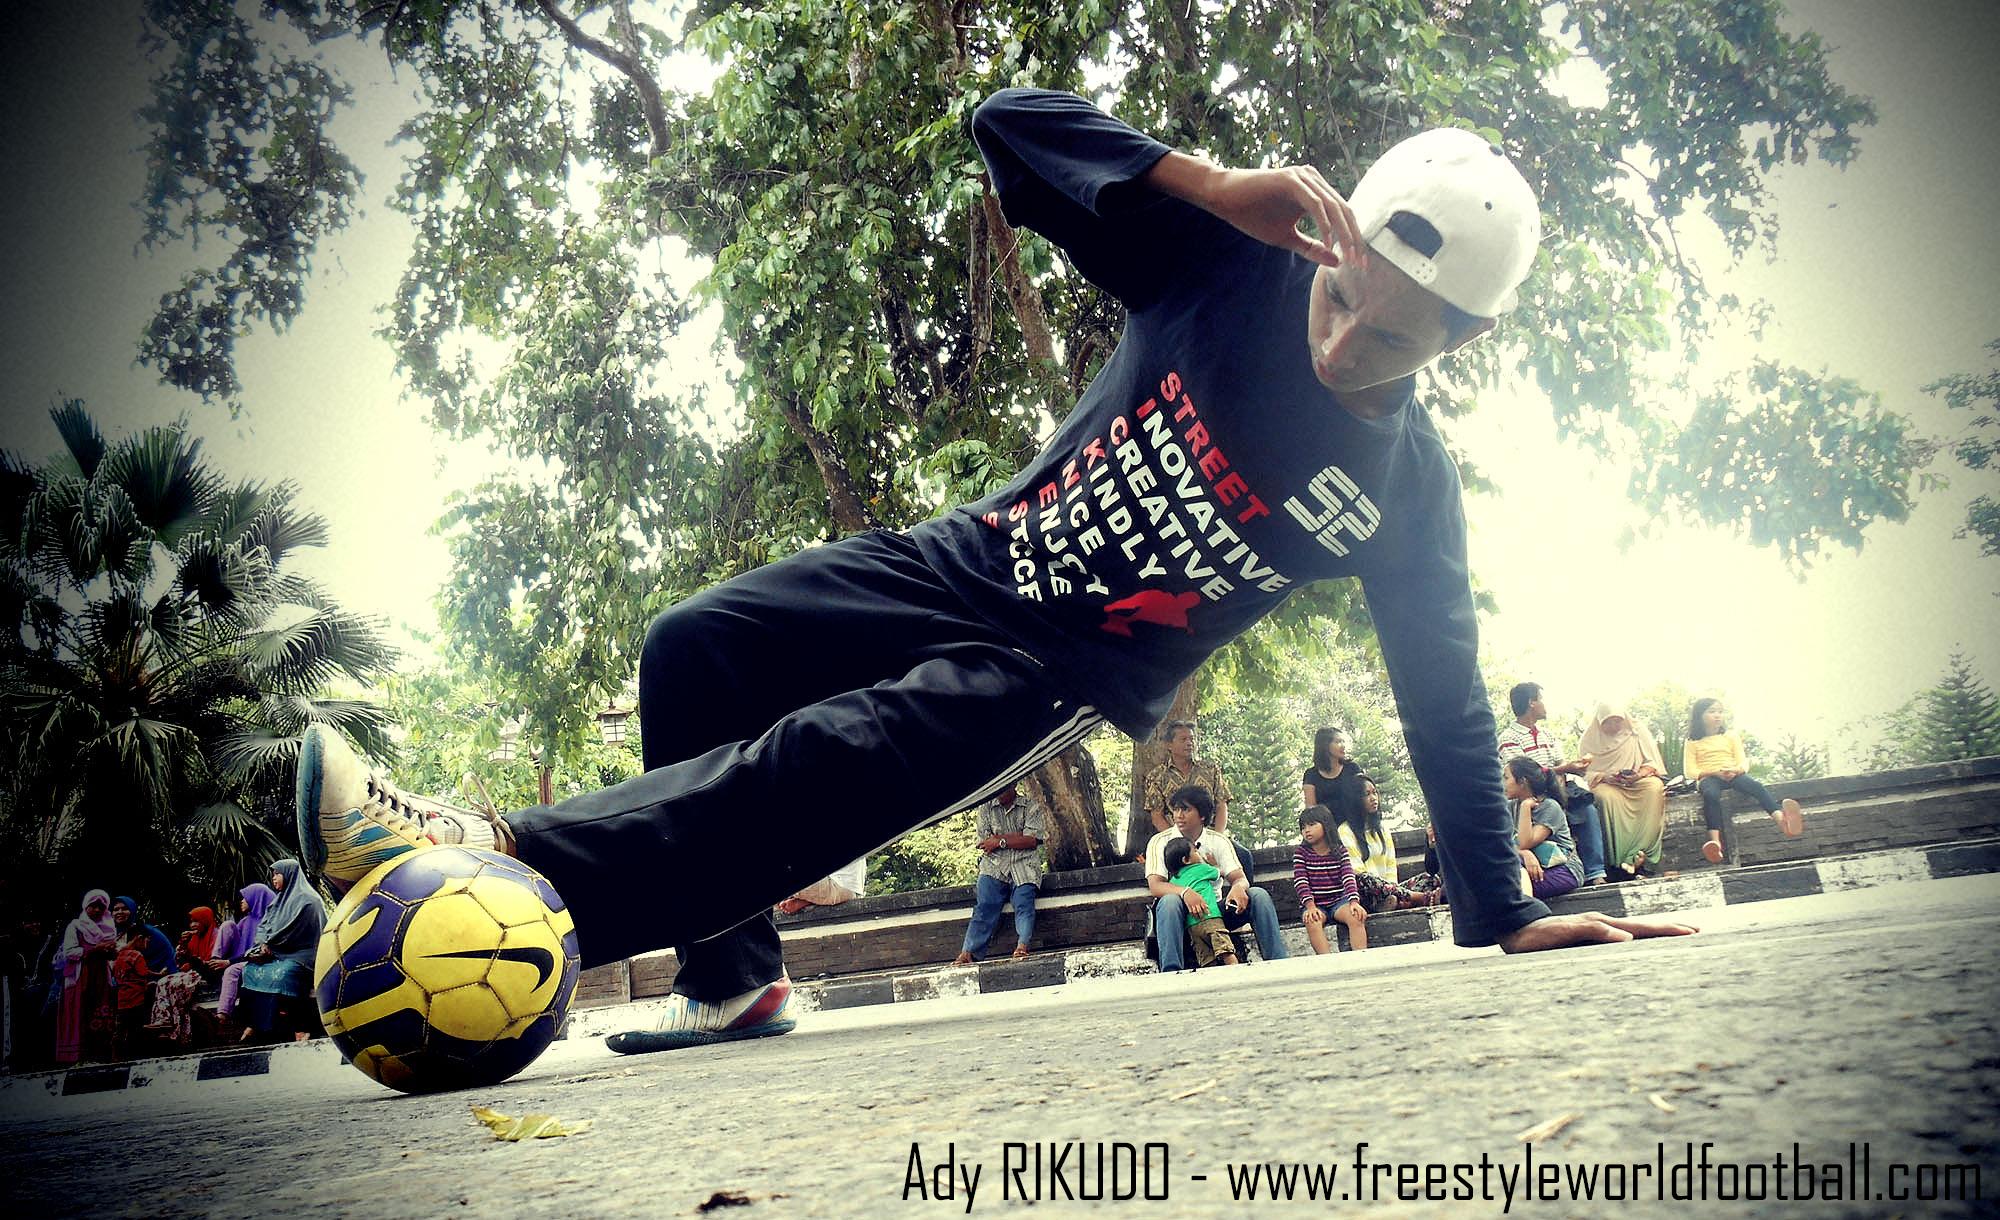 Ady RIKUDO - 005 - www.freestyleworldfootball.com.jpg